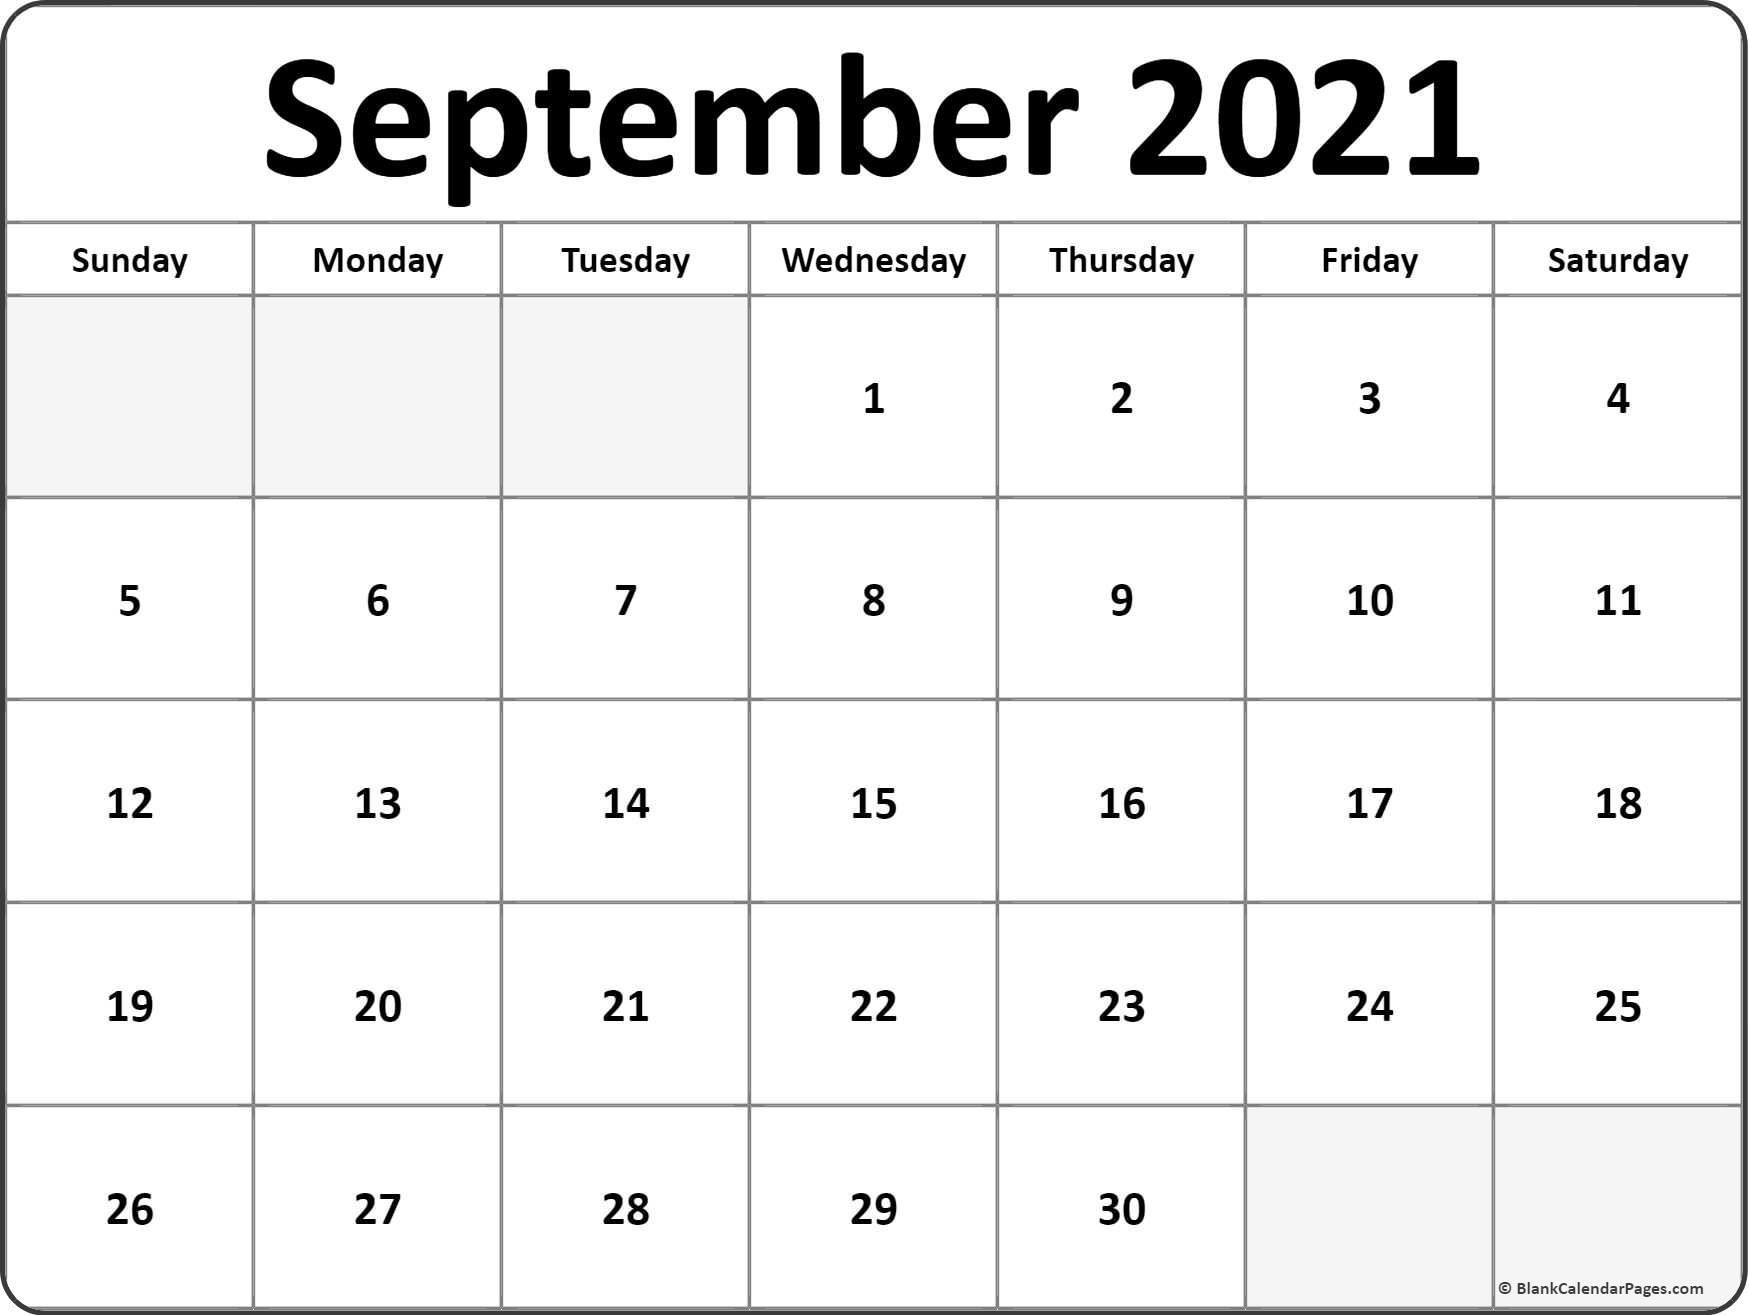 September 2021 Blank Calendar Collection. September - December 2021 Calendar